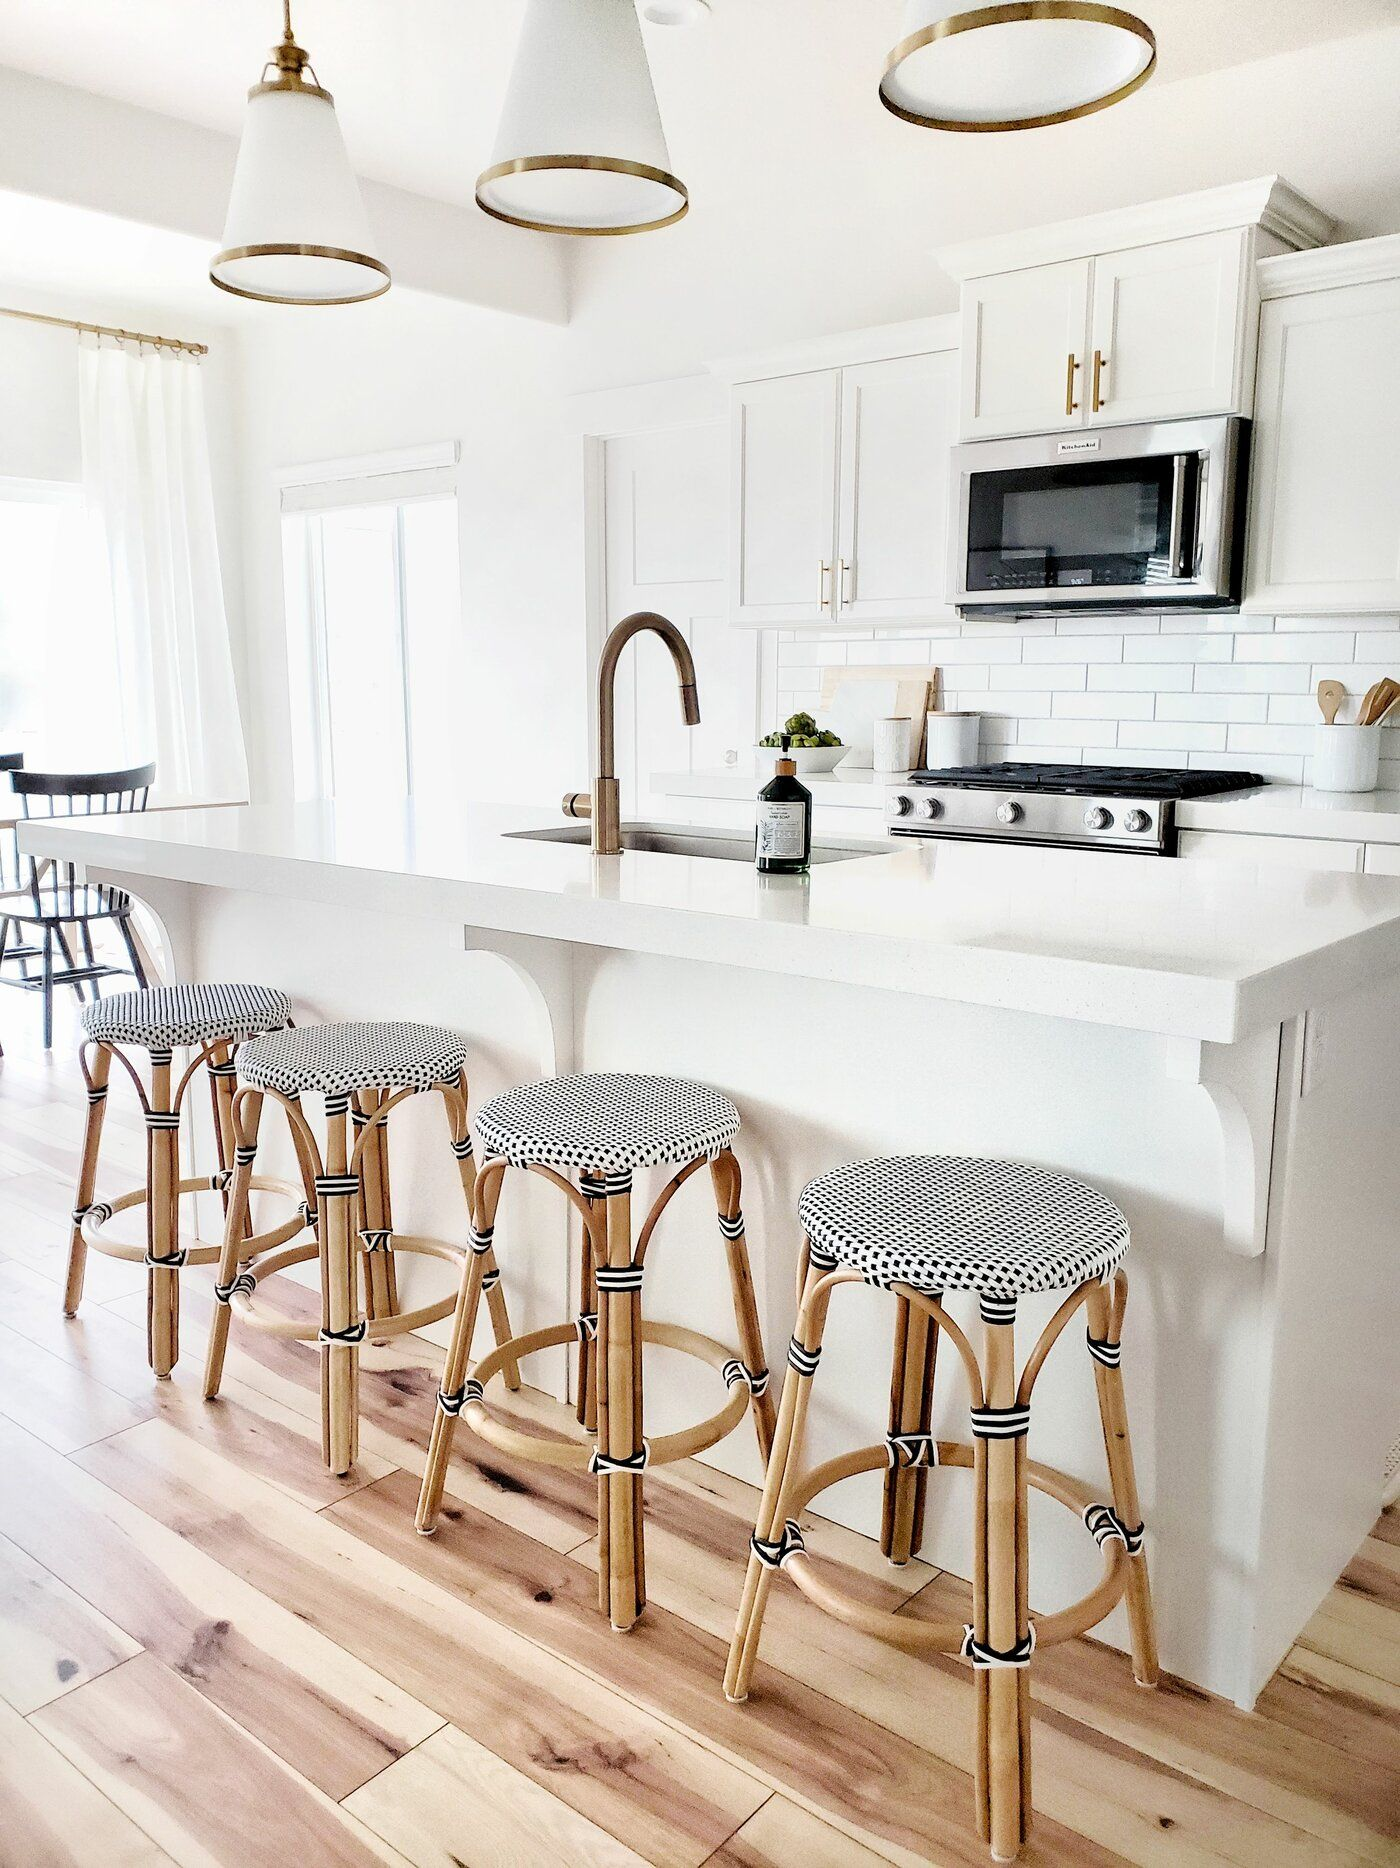 Pin By Jen Schwab On Cozinhas In 2020 Kitchen Renovation Design Kitchen Remodel Software Kitchen Remodel